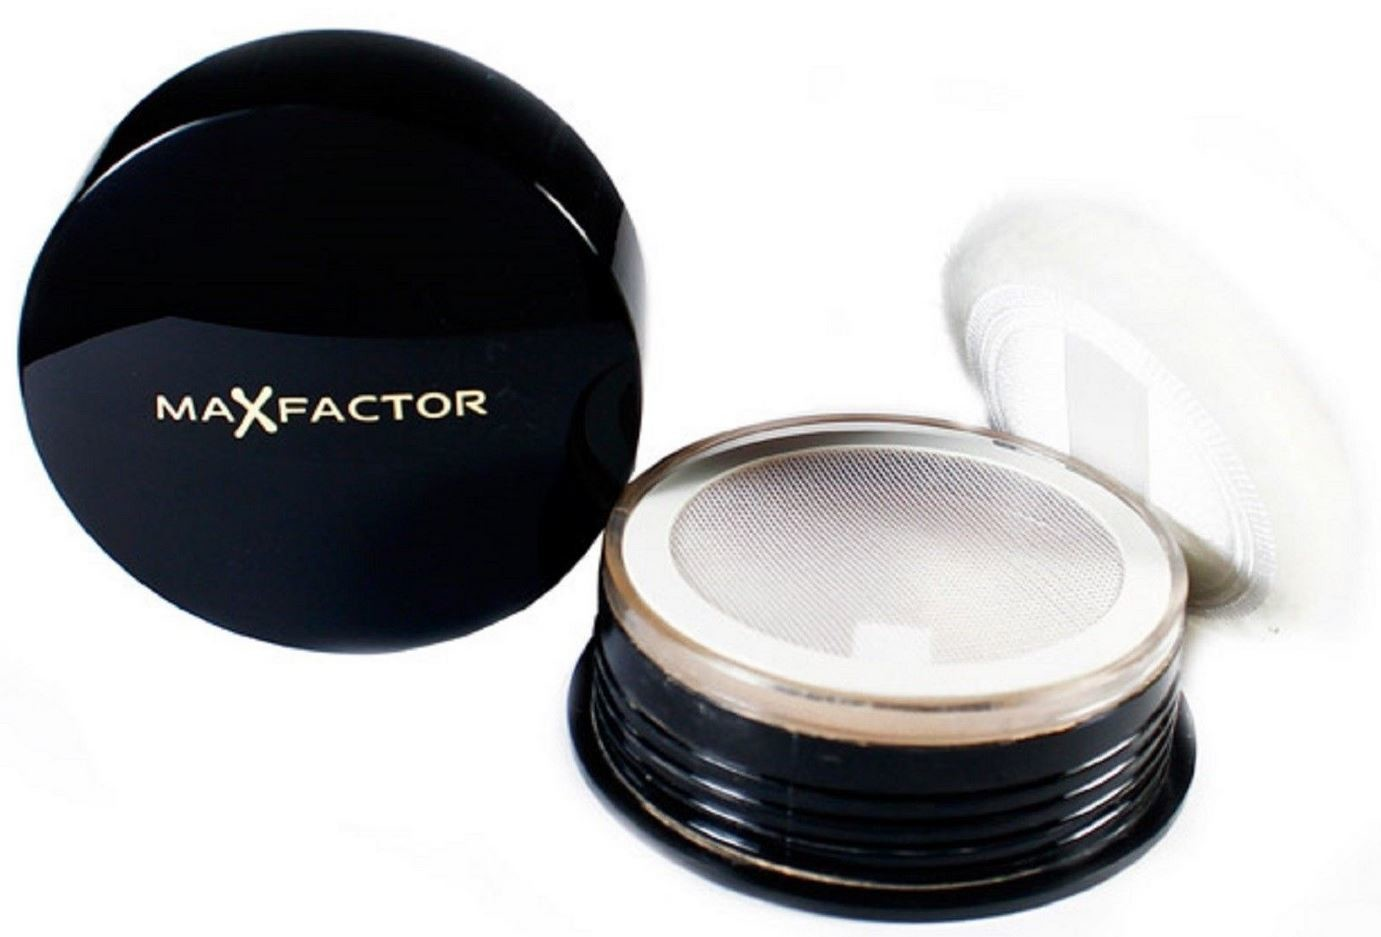 Max Factor Professional Loose Powder Translucent